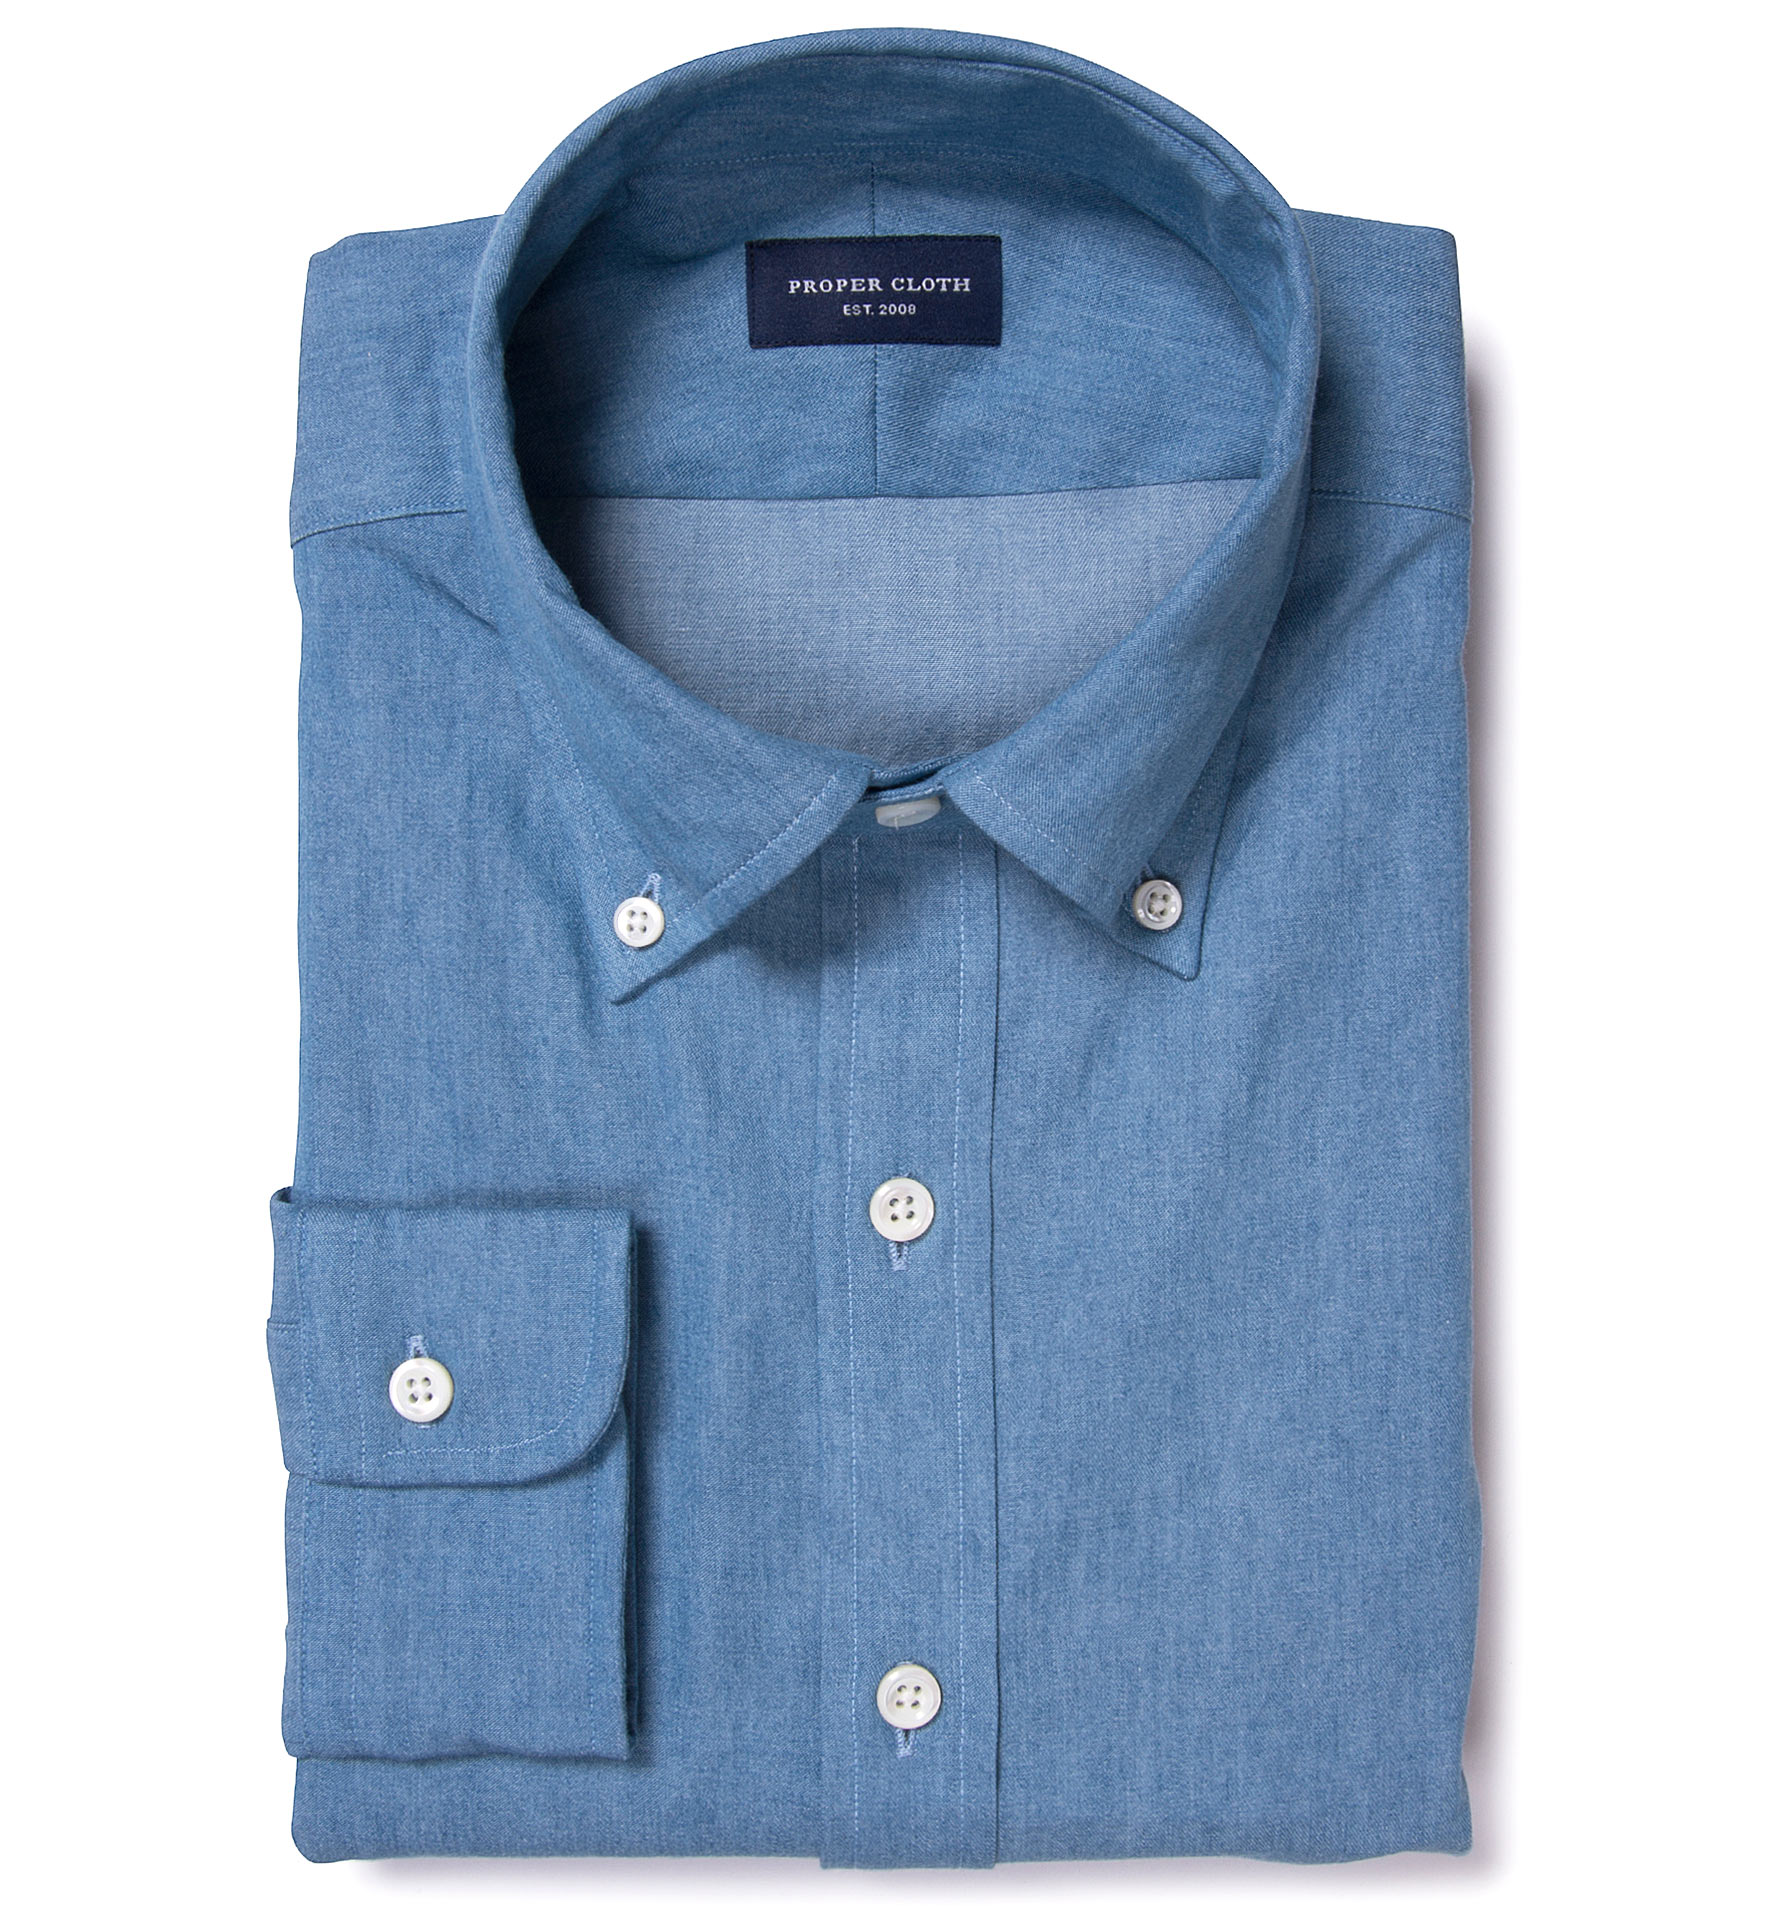 Chambray Vs Denim Proper Cloth Reference